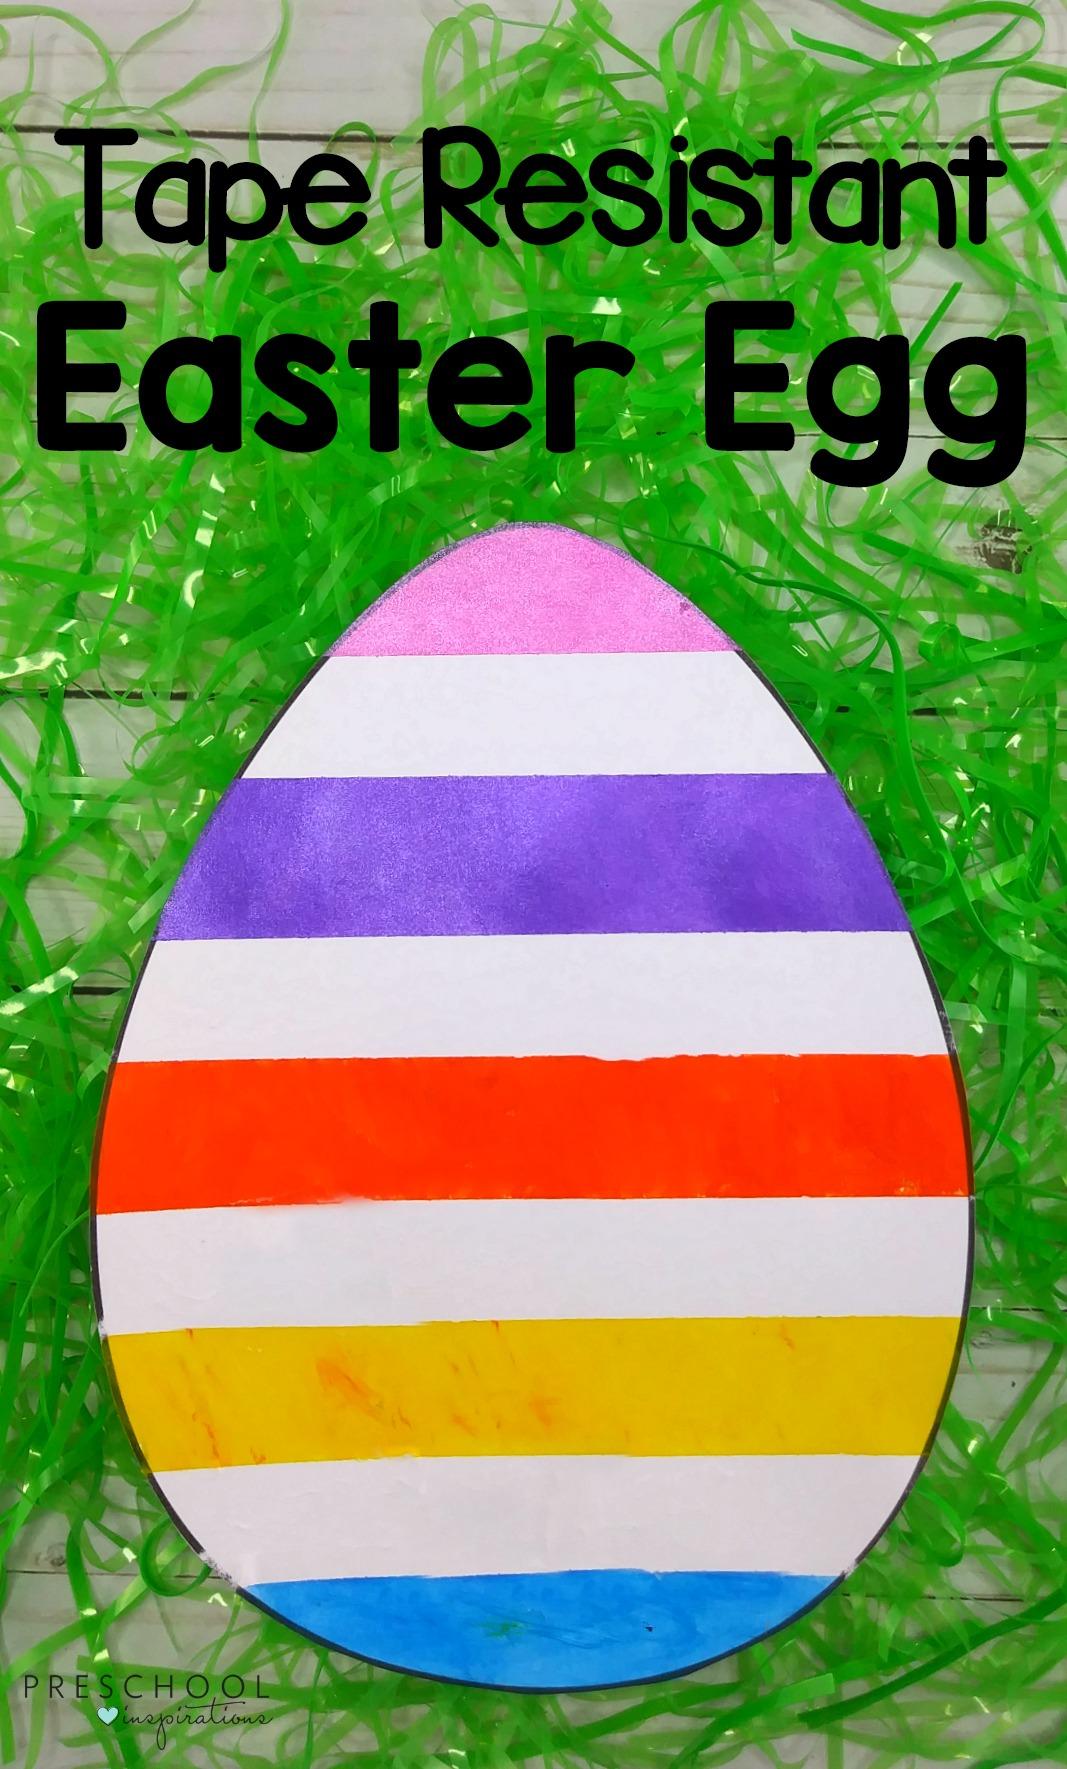 Tape resist Easter egg art the kids can make themselves